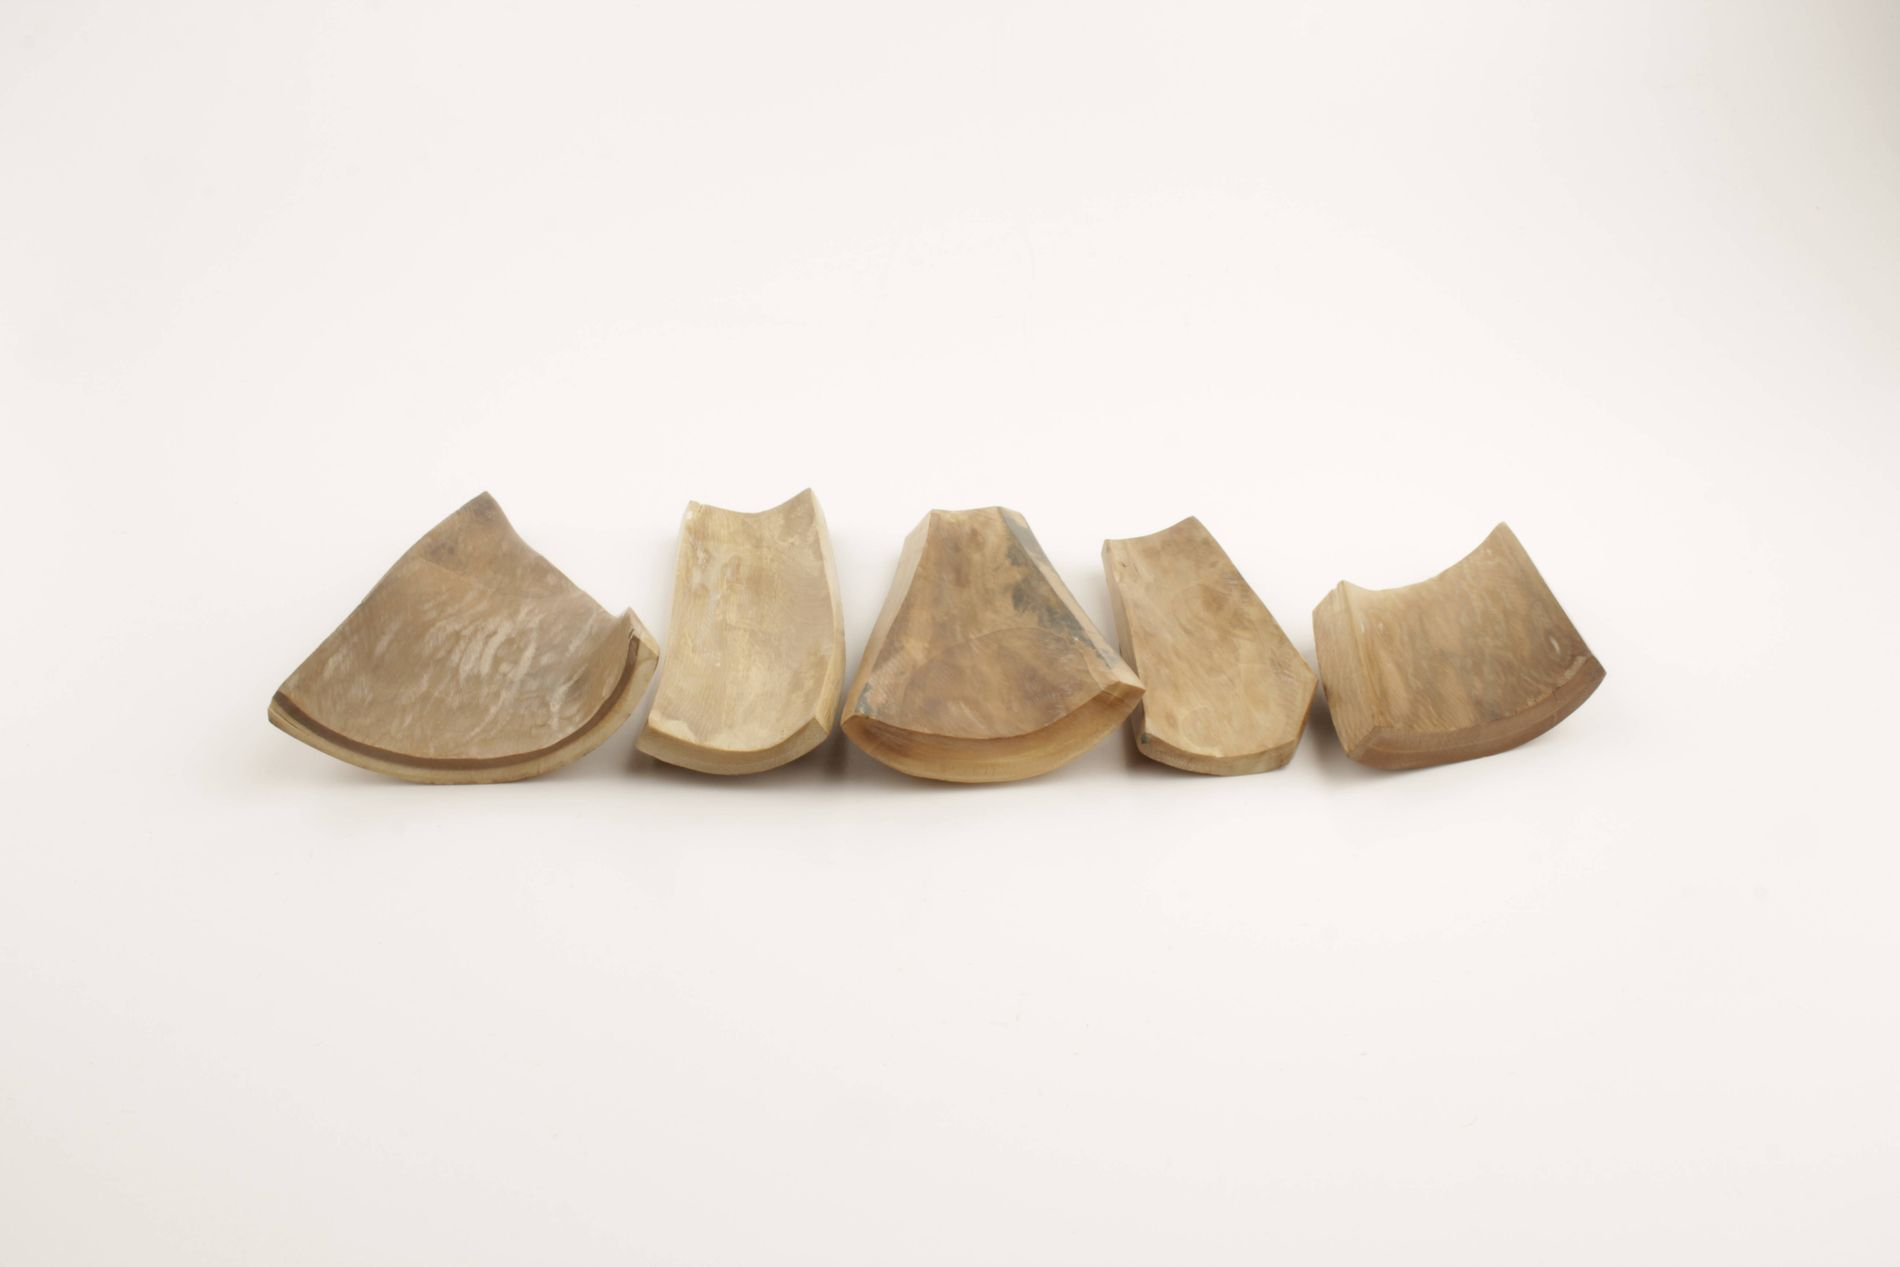 Beige mammoth ivory pieces